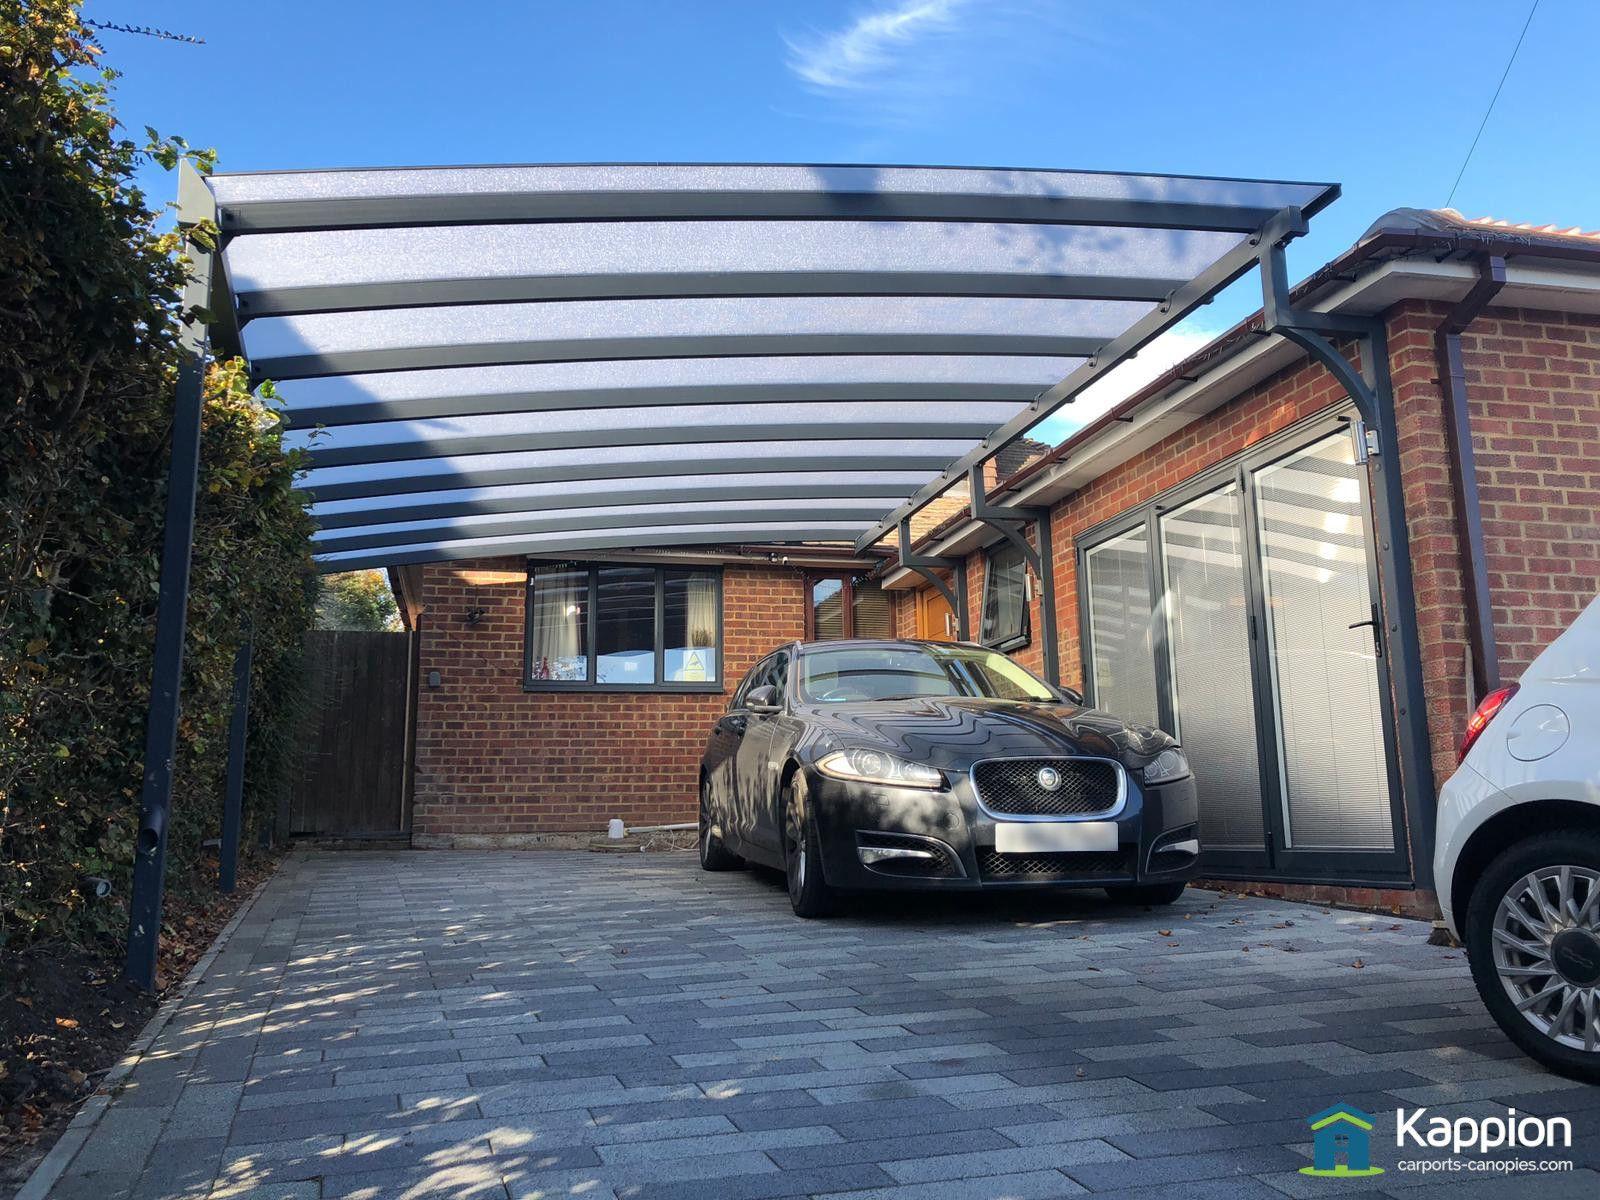 Handmade Carports & Canopies in 2020 Carport canopy